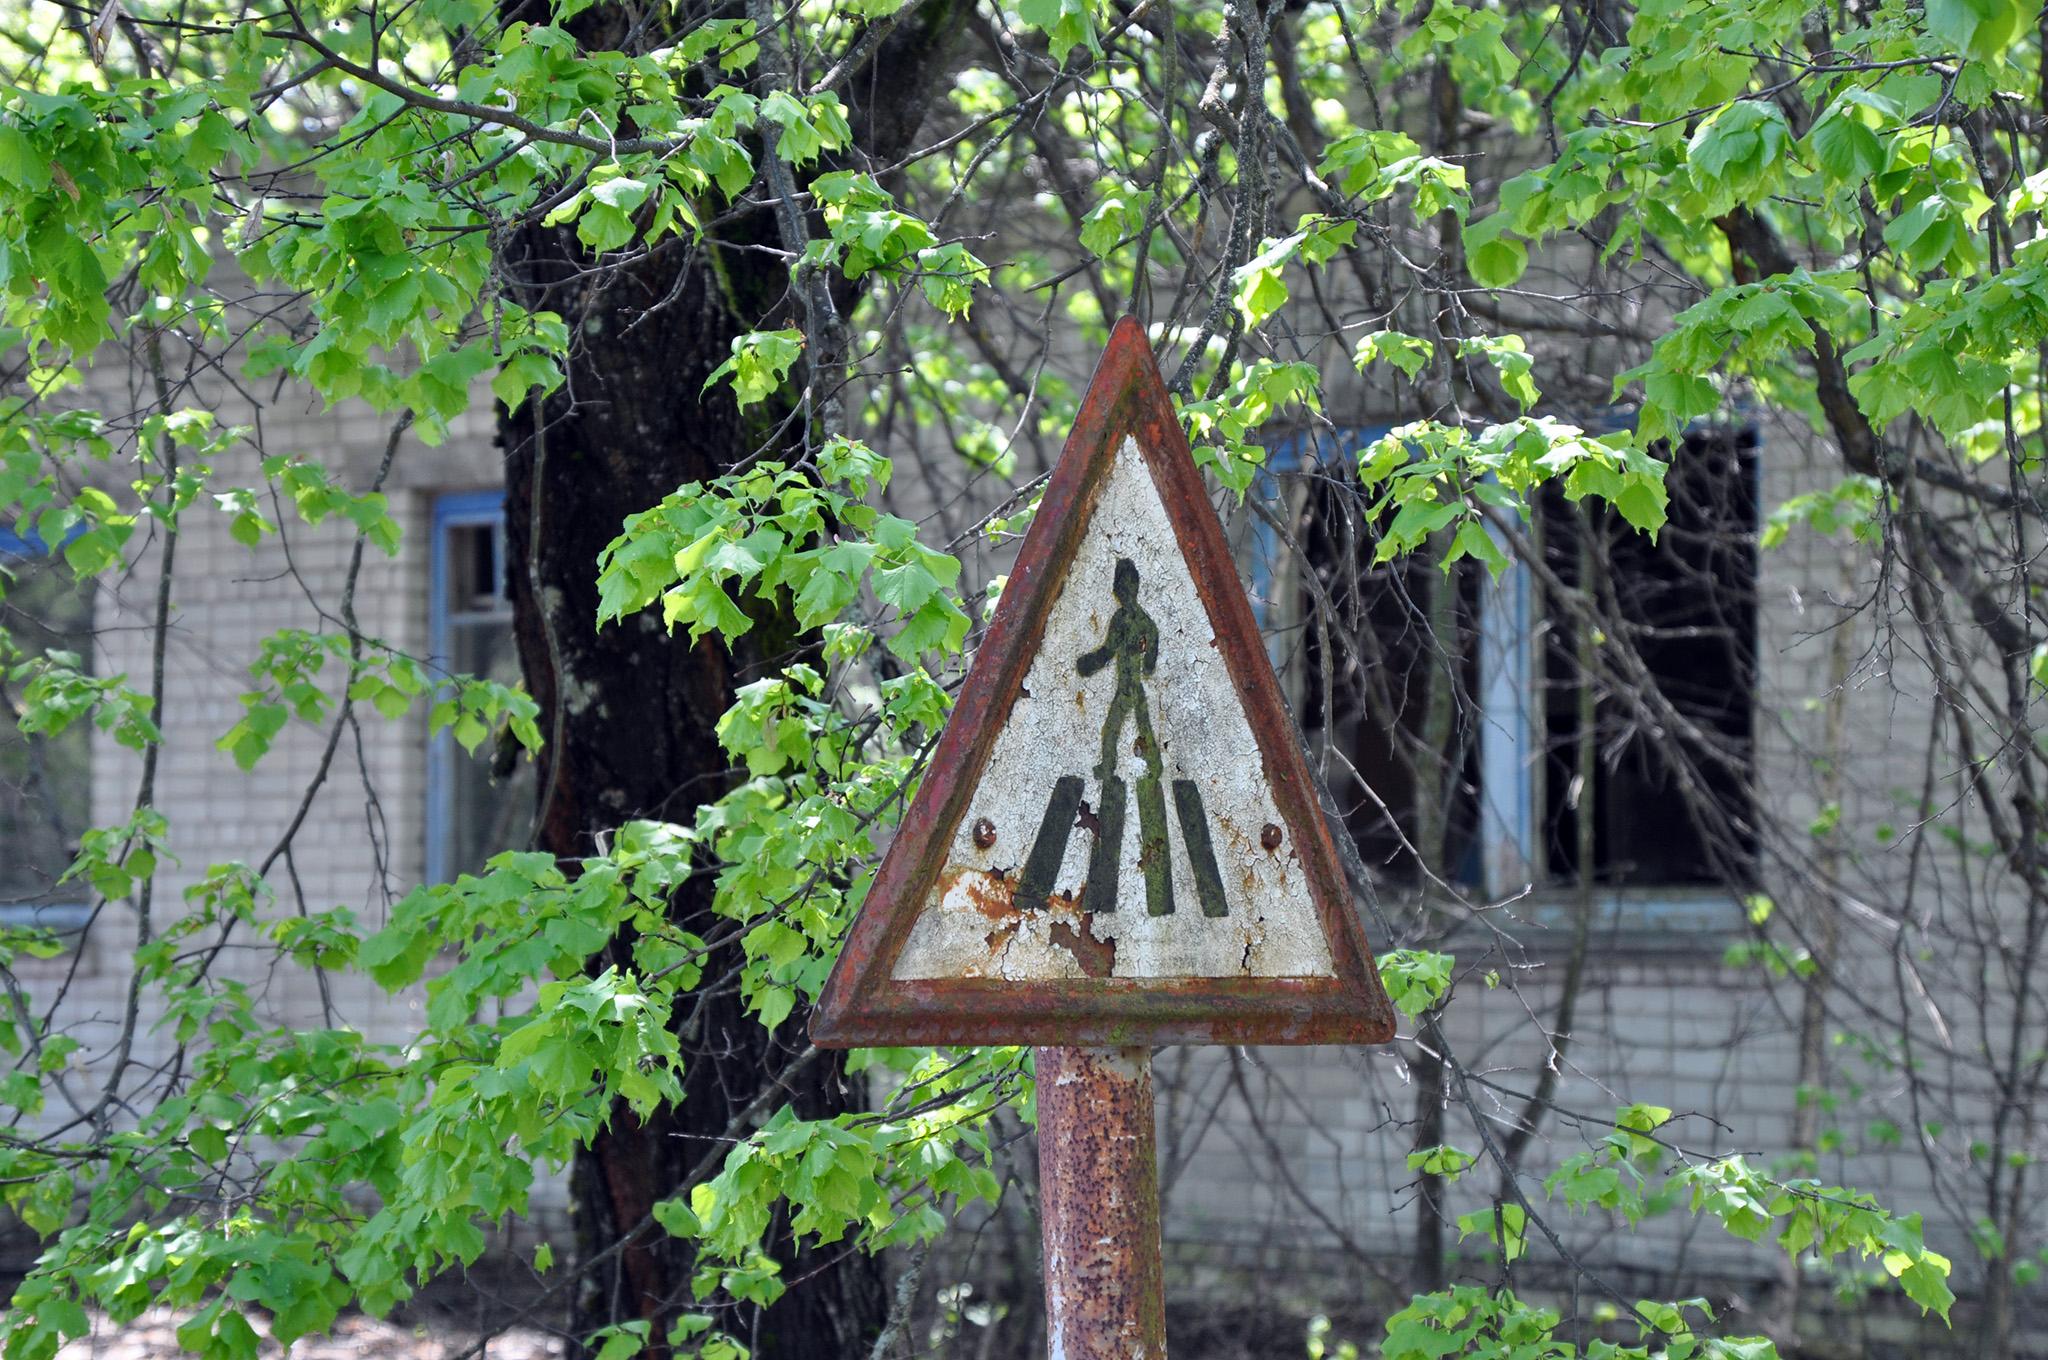 Visitar Chernóbil - Visitar Chernobyl Ucrania Ukraine Pripyat visitar chernóbil - 47045823744 d1a04f4c87 o - Visitar Chernóbil: el lugar más contaminado del planeta